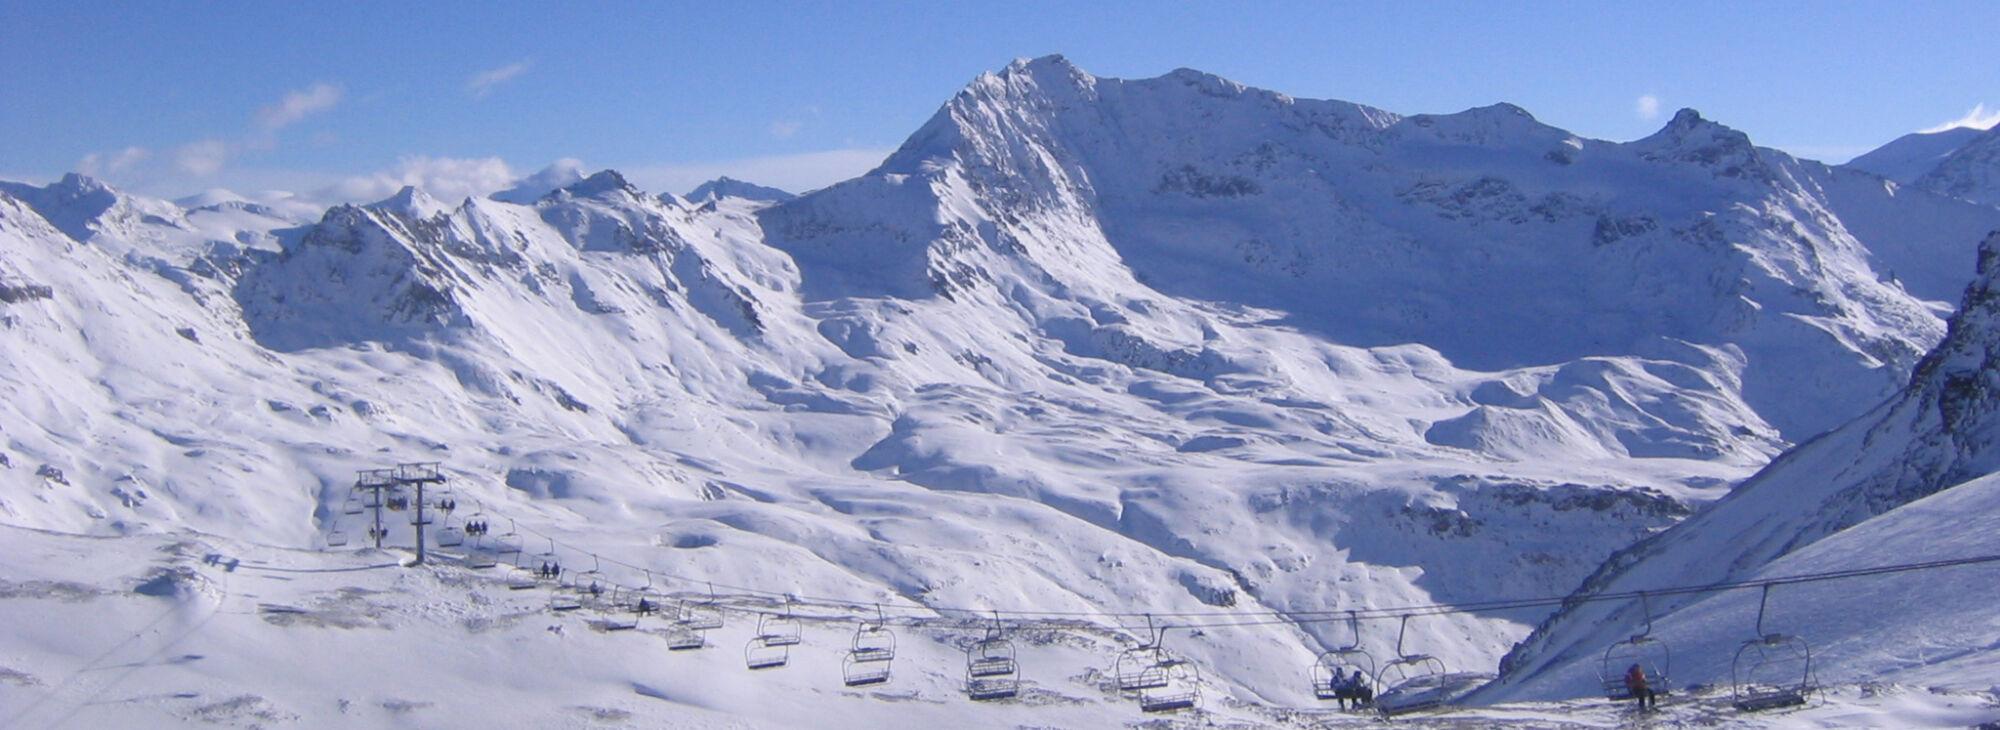 Skilift am Grande Motte-Gletscher